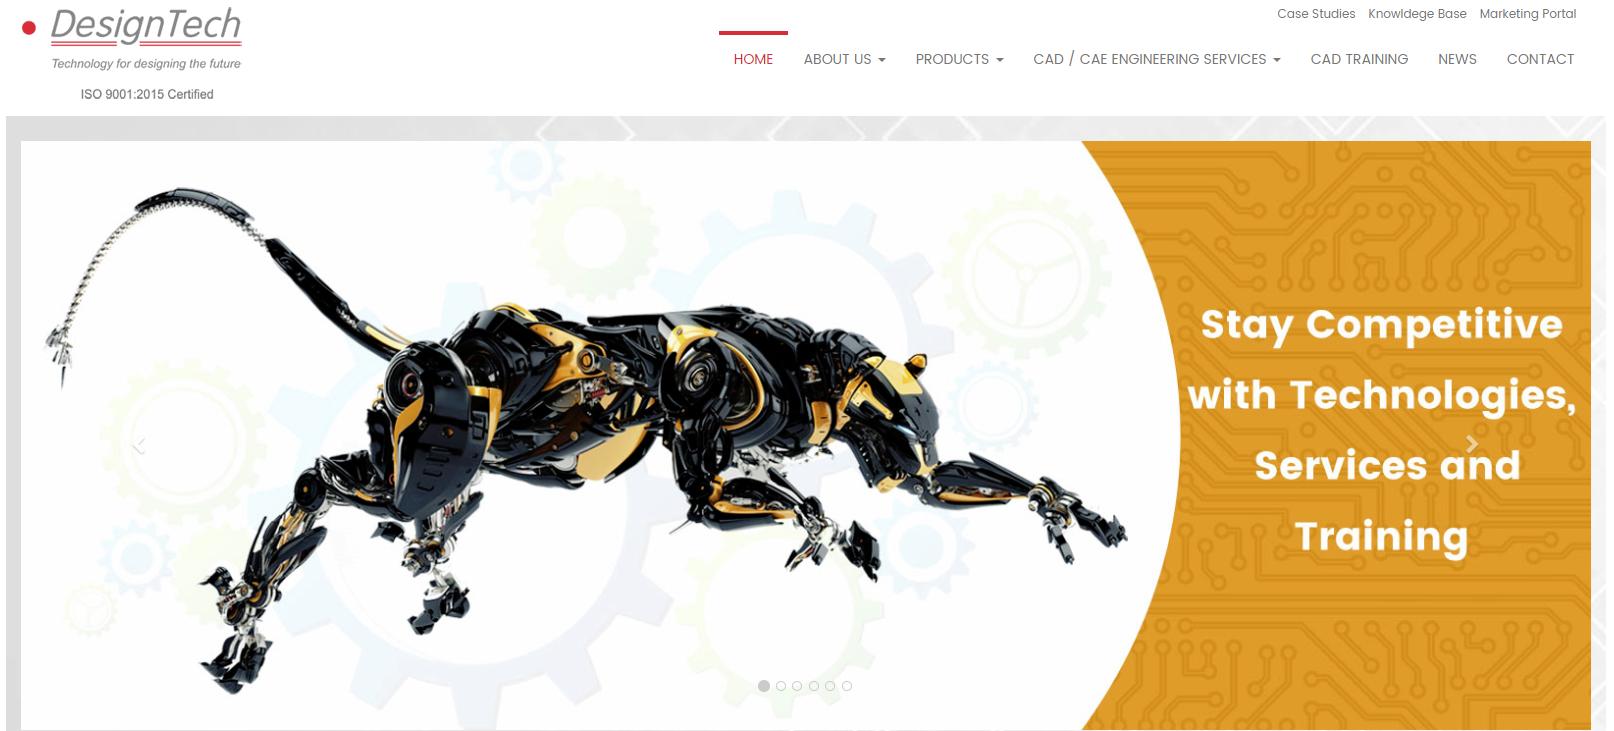 DesignTech - helping India adopt dimensional management